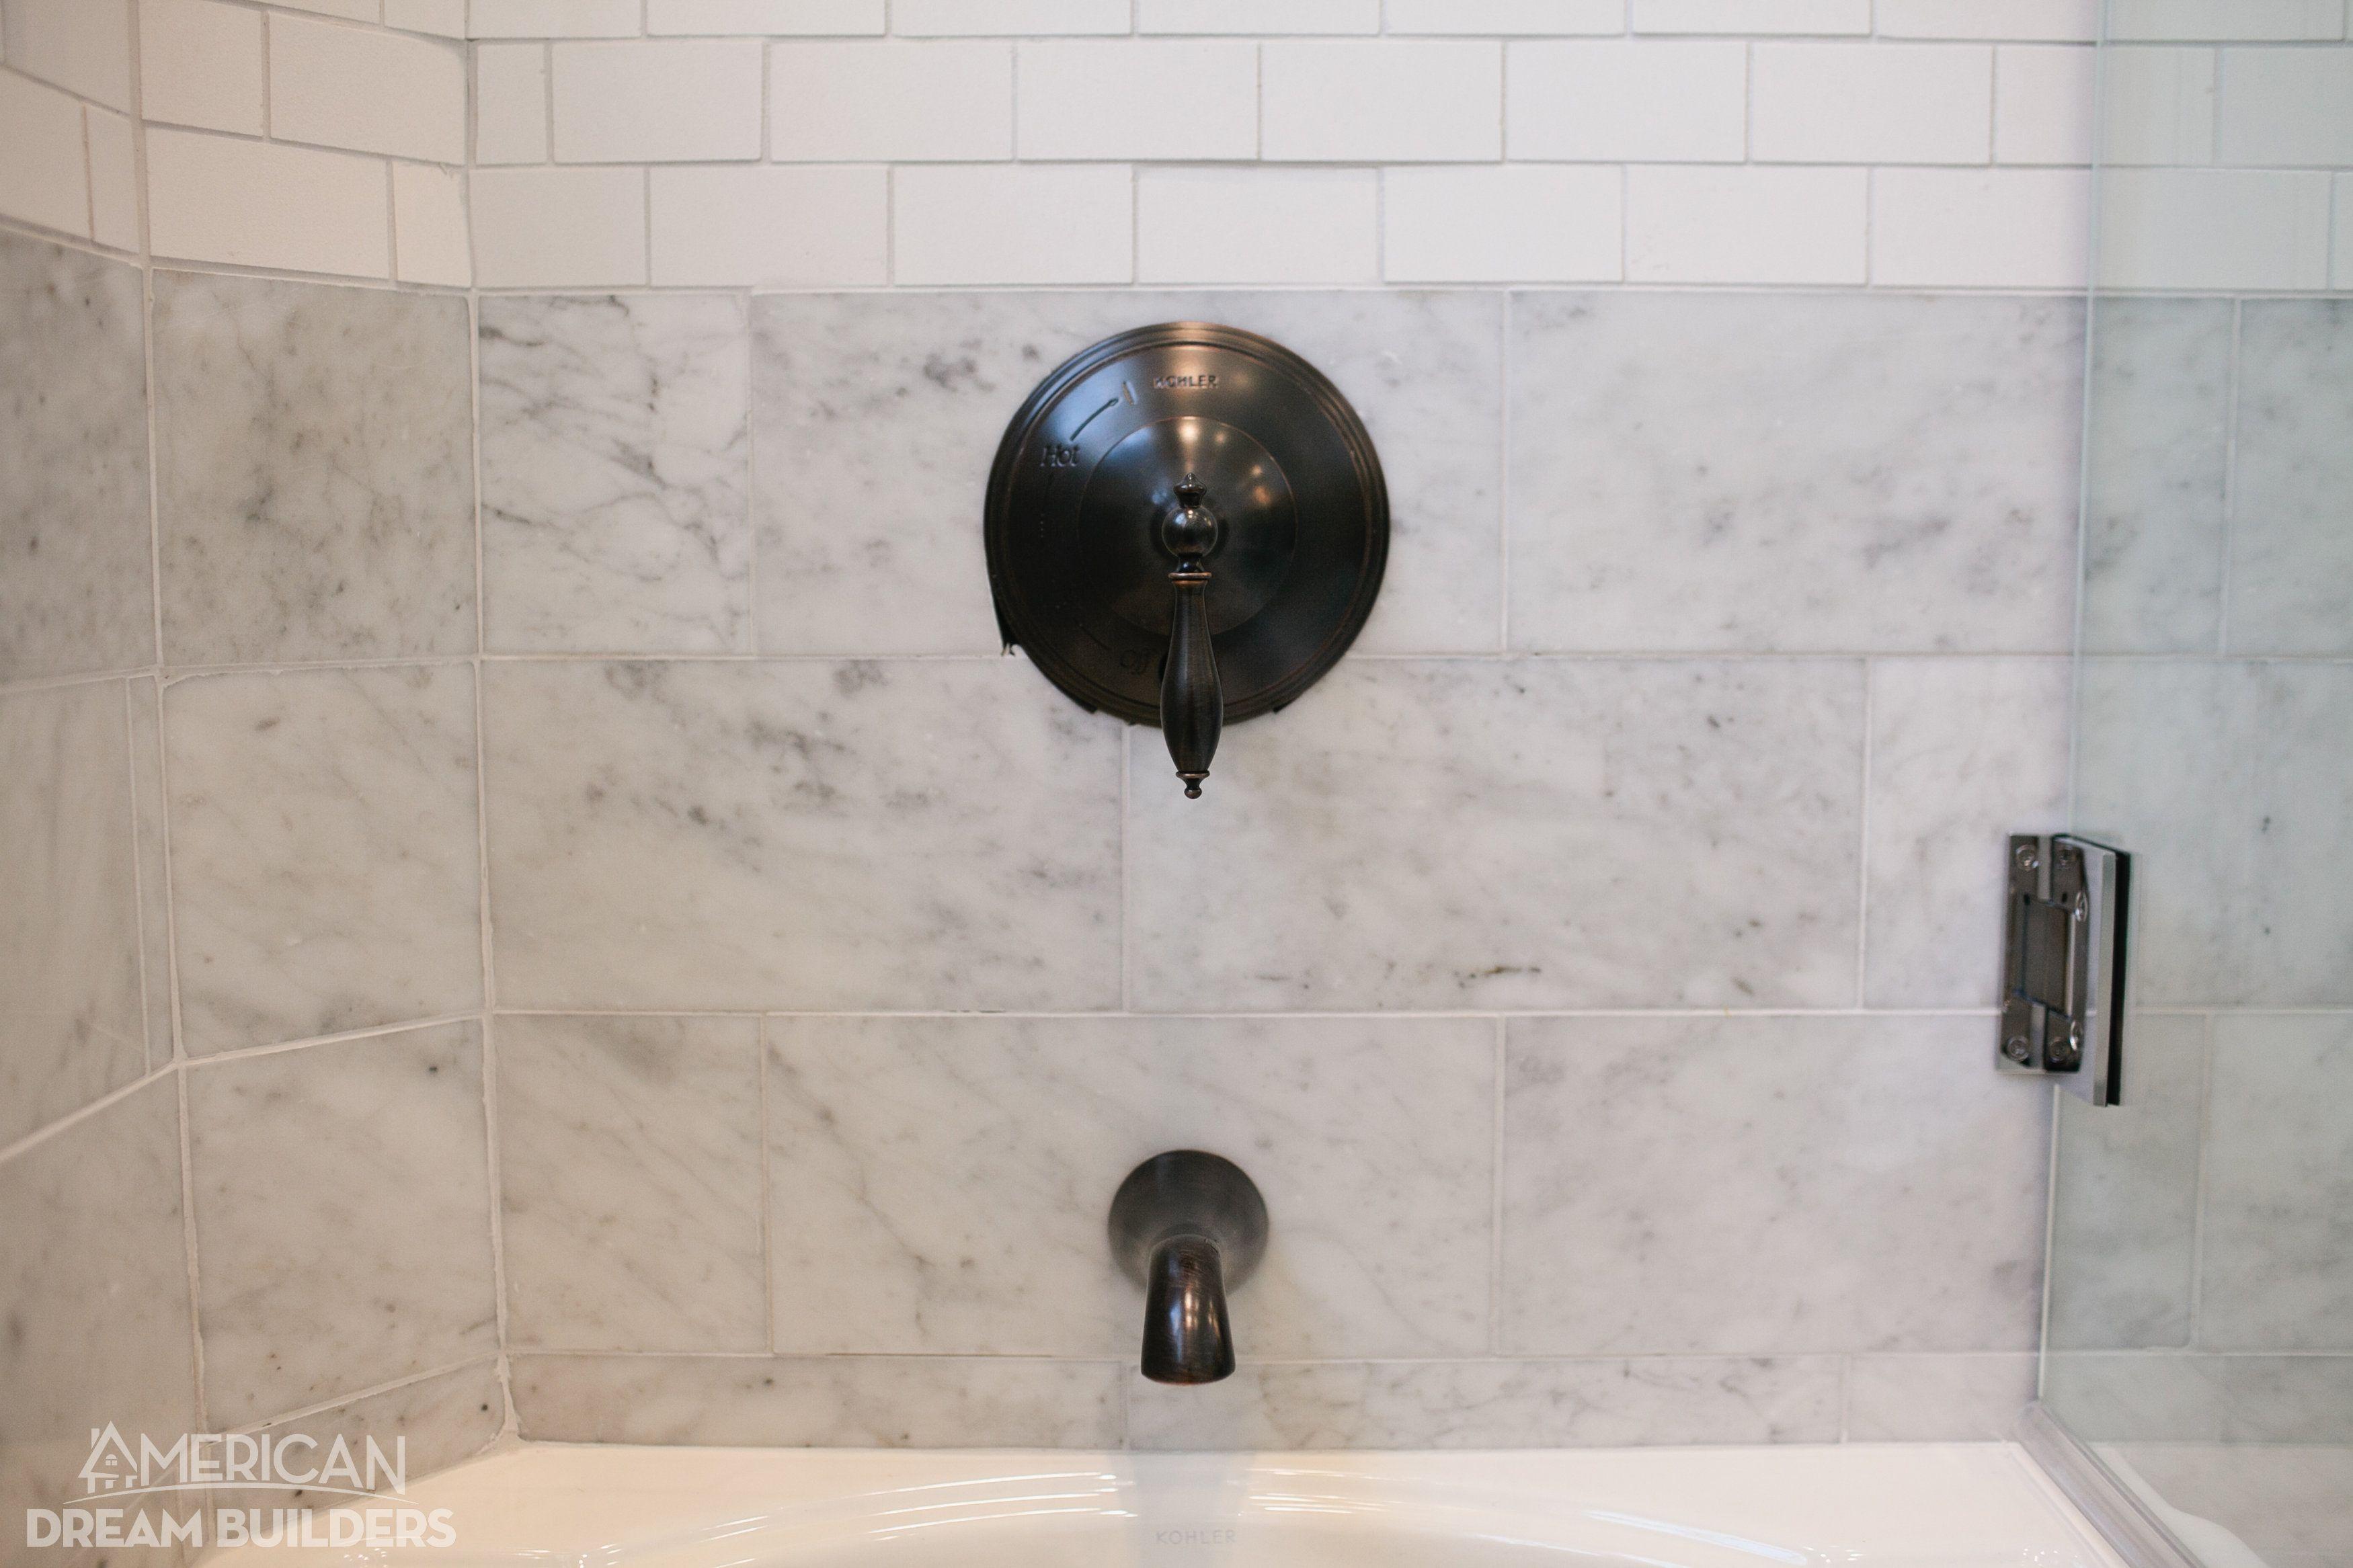 Wall Tile Florentine 10 X 14 Carrara Fl06 With Rittenhouse Square 3 X 6 Artic White 0190